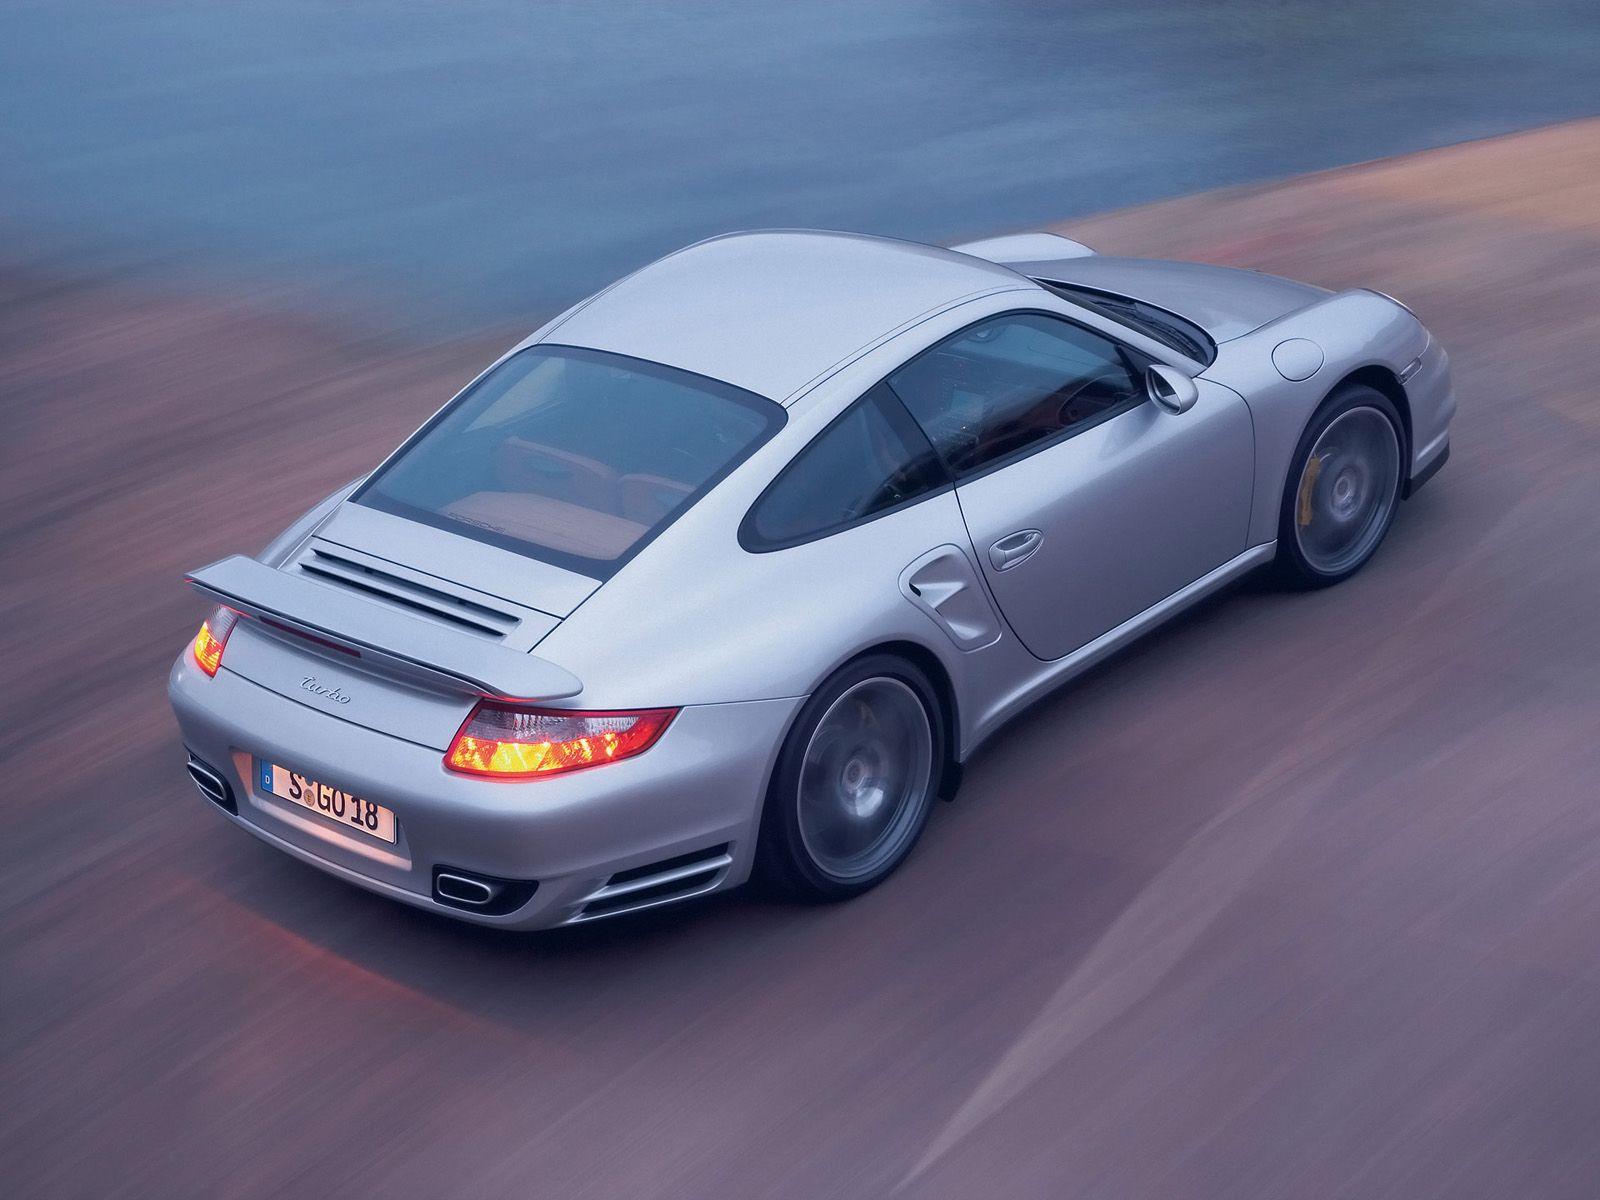 Porsche 911 Turbo Porsche 911 Turbo 911 Turbo Porsche 911